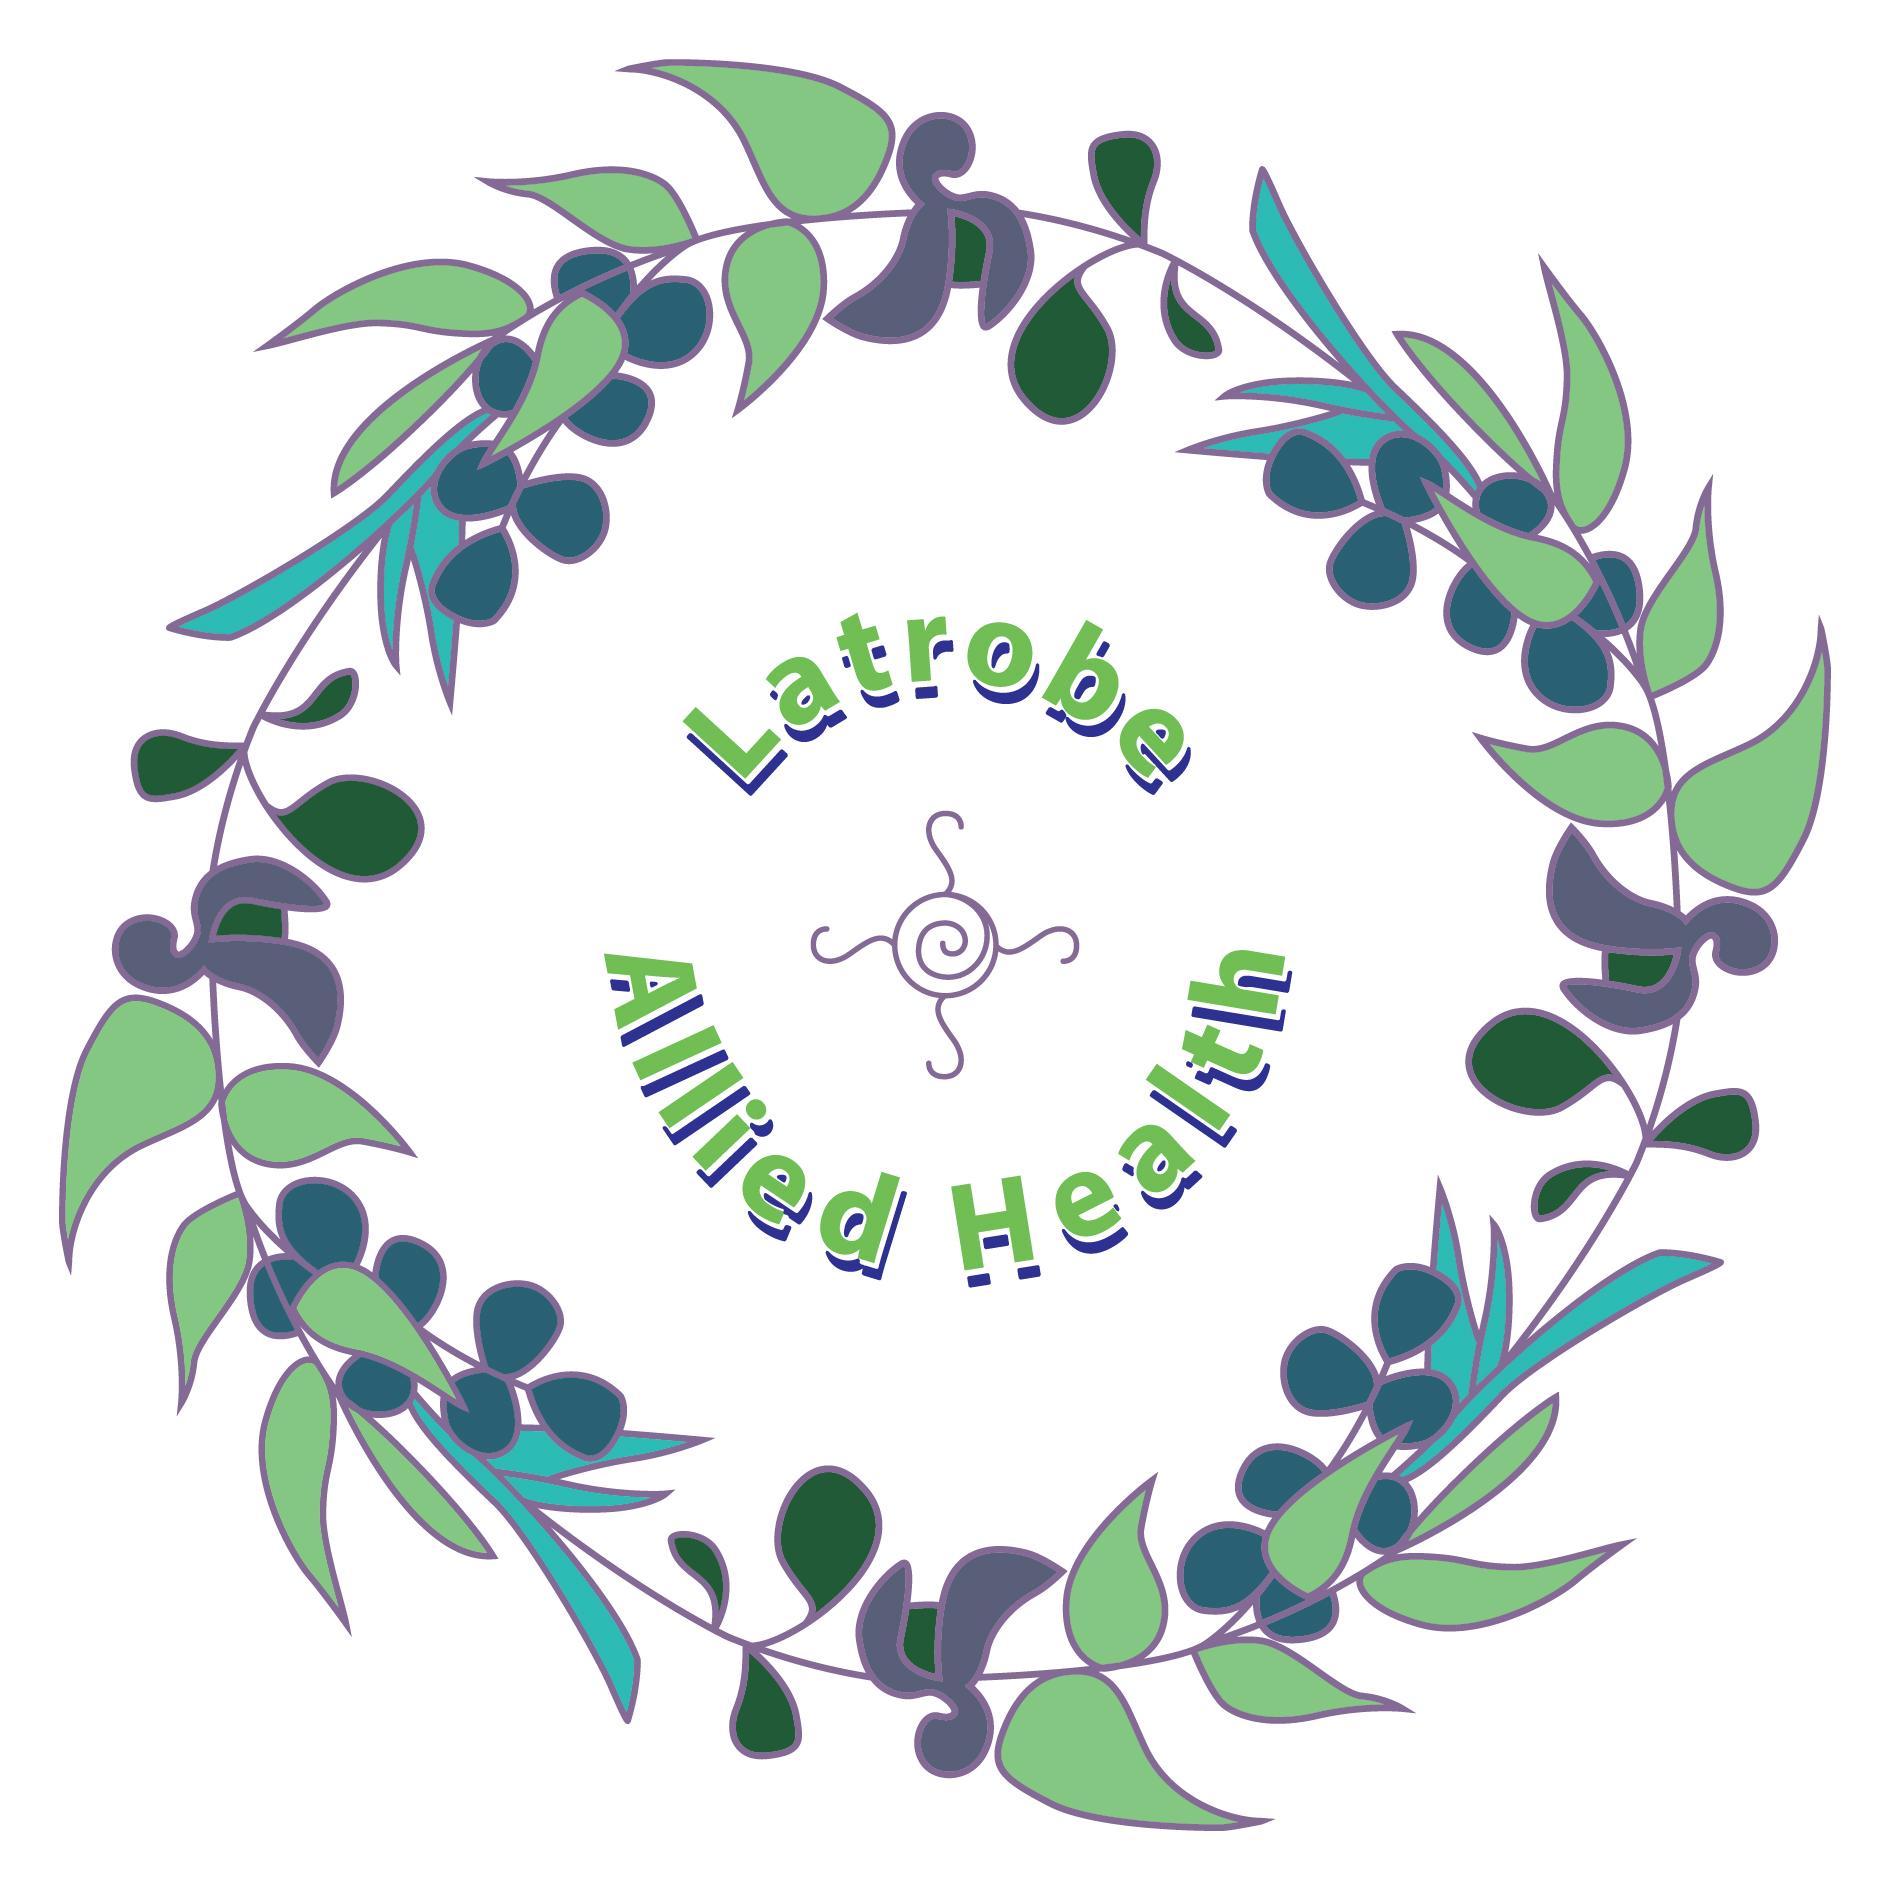 latrobe allied health